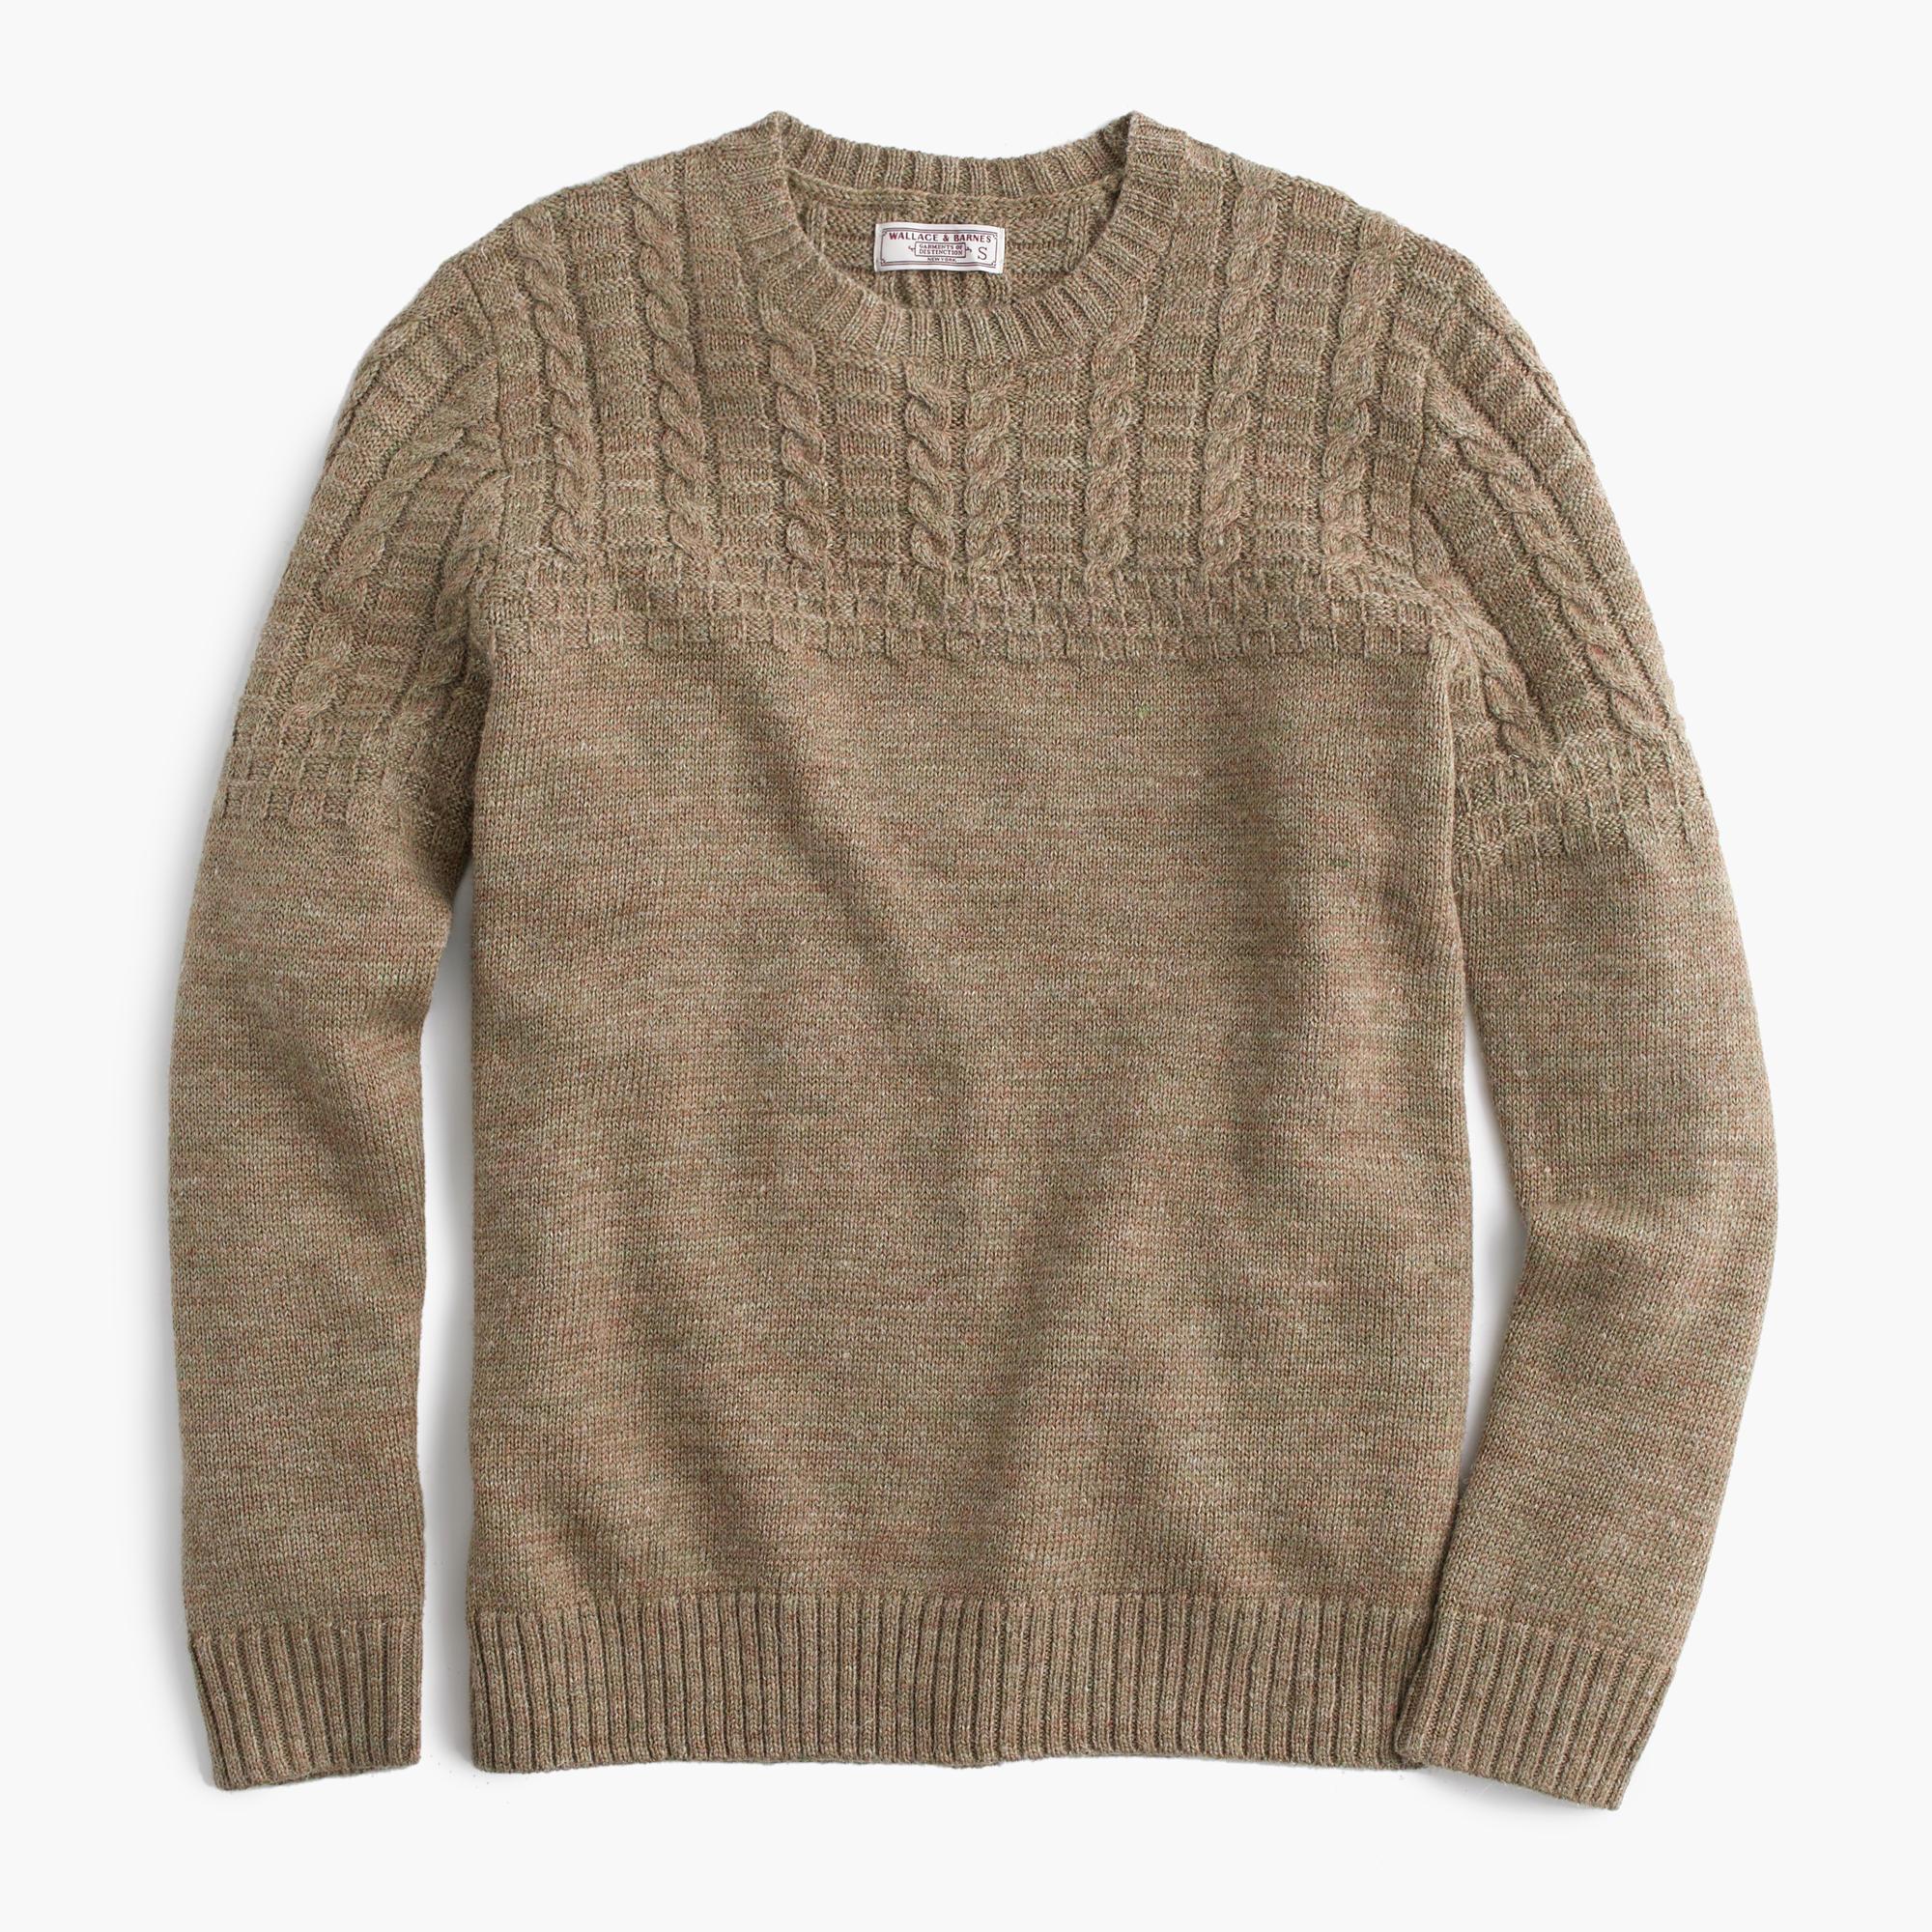 Splendid Sweaters